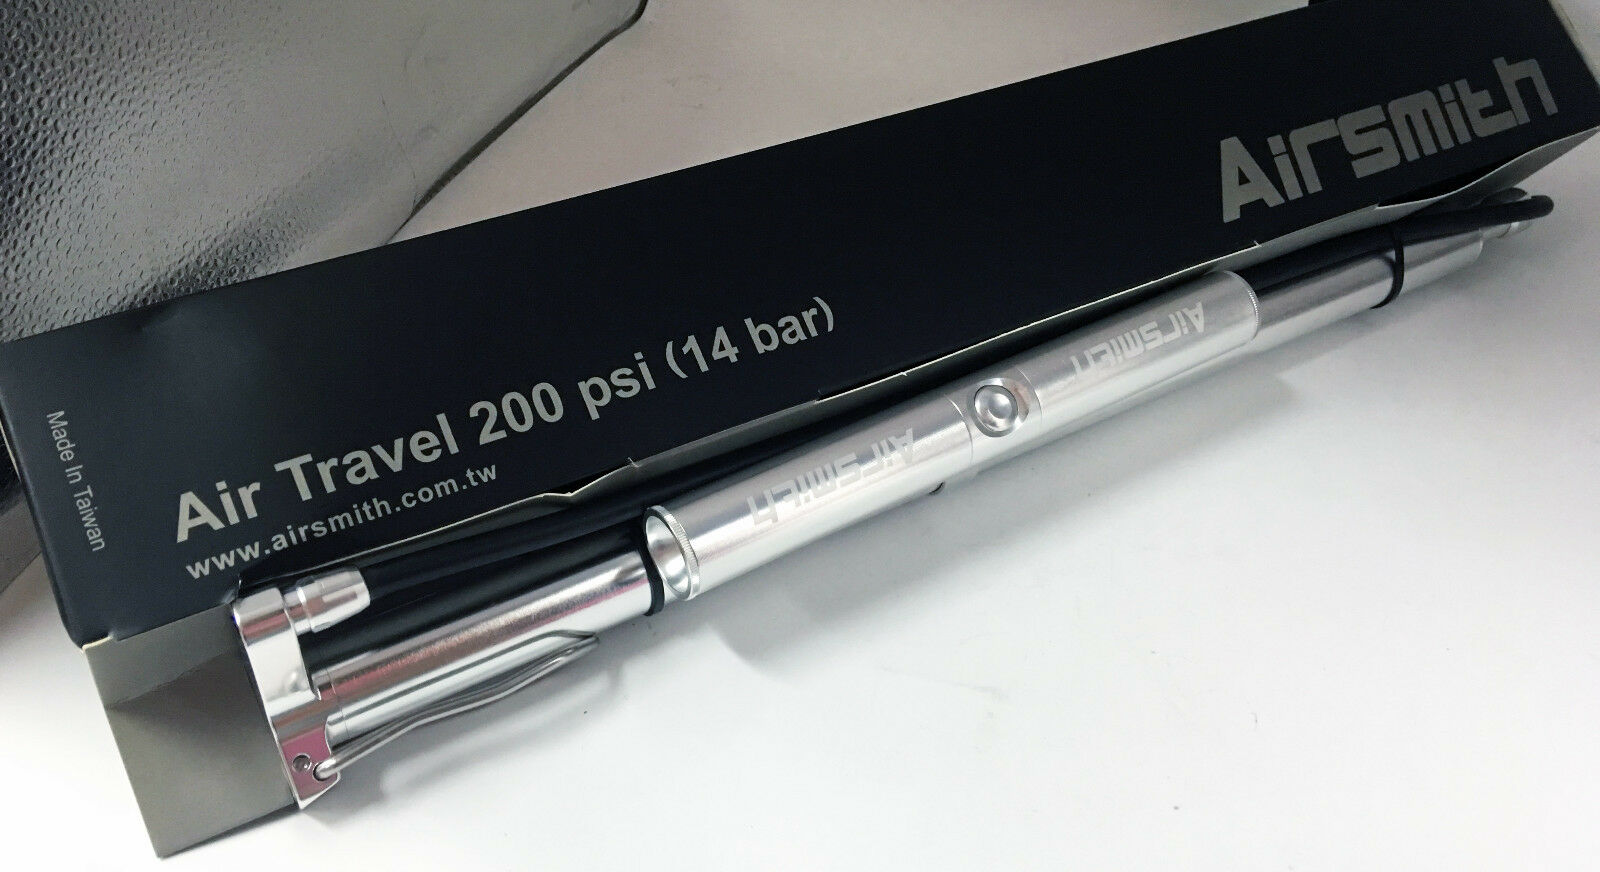 Airsmith Air Travel Metal Calibre 200psi Plata